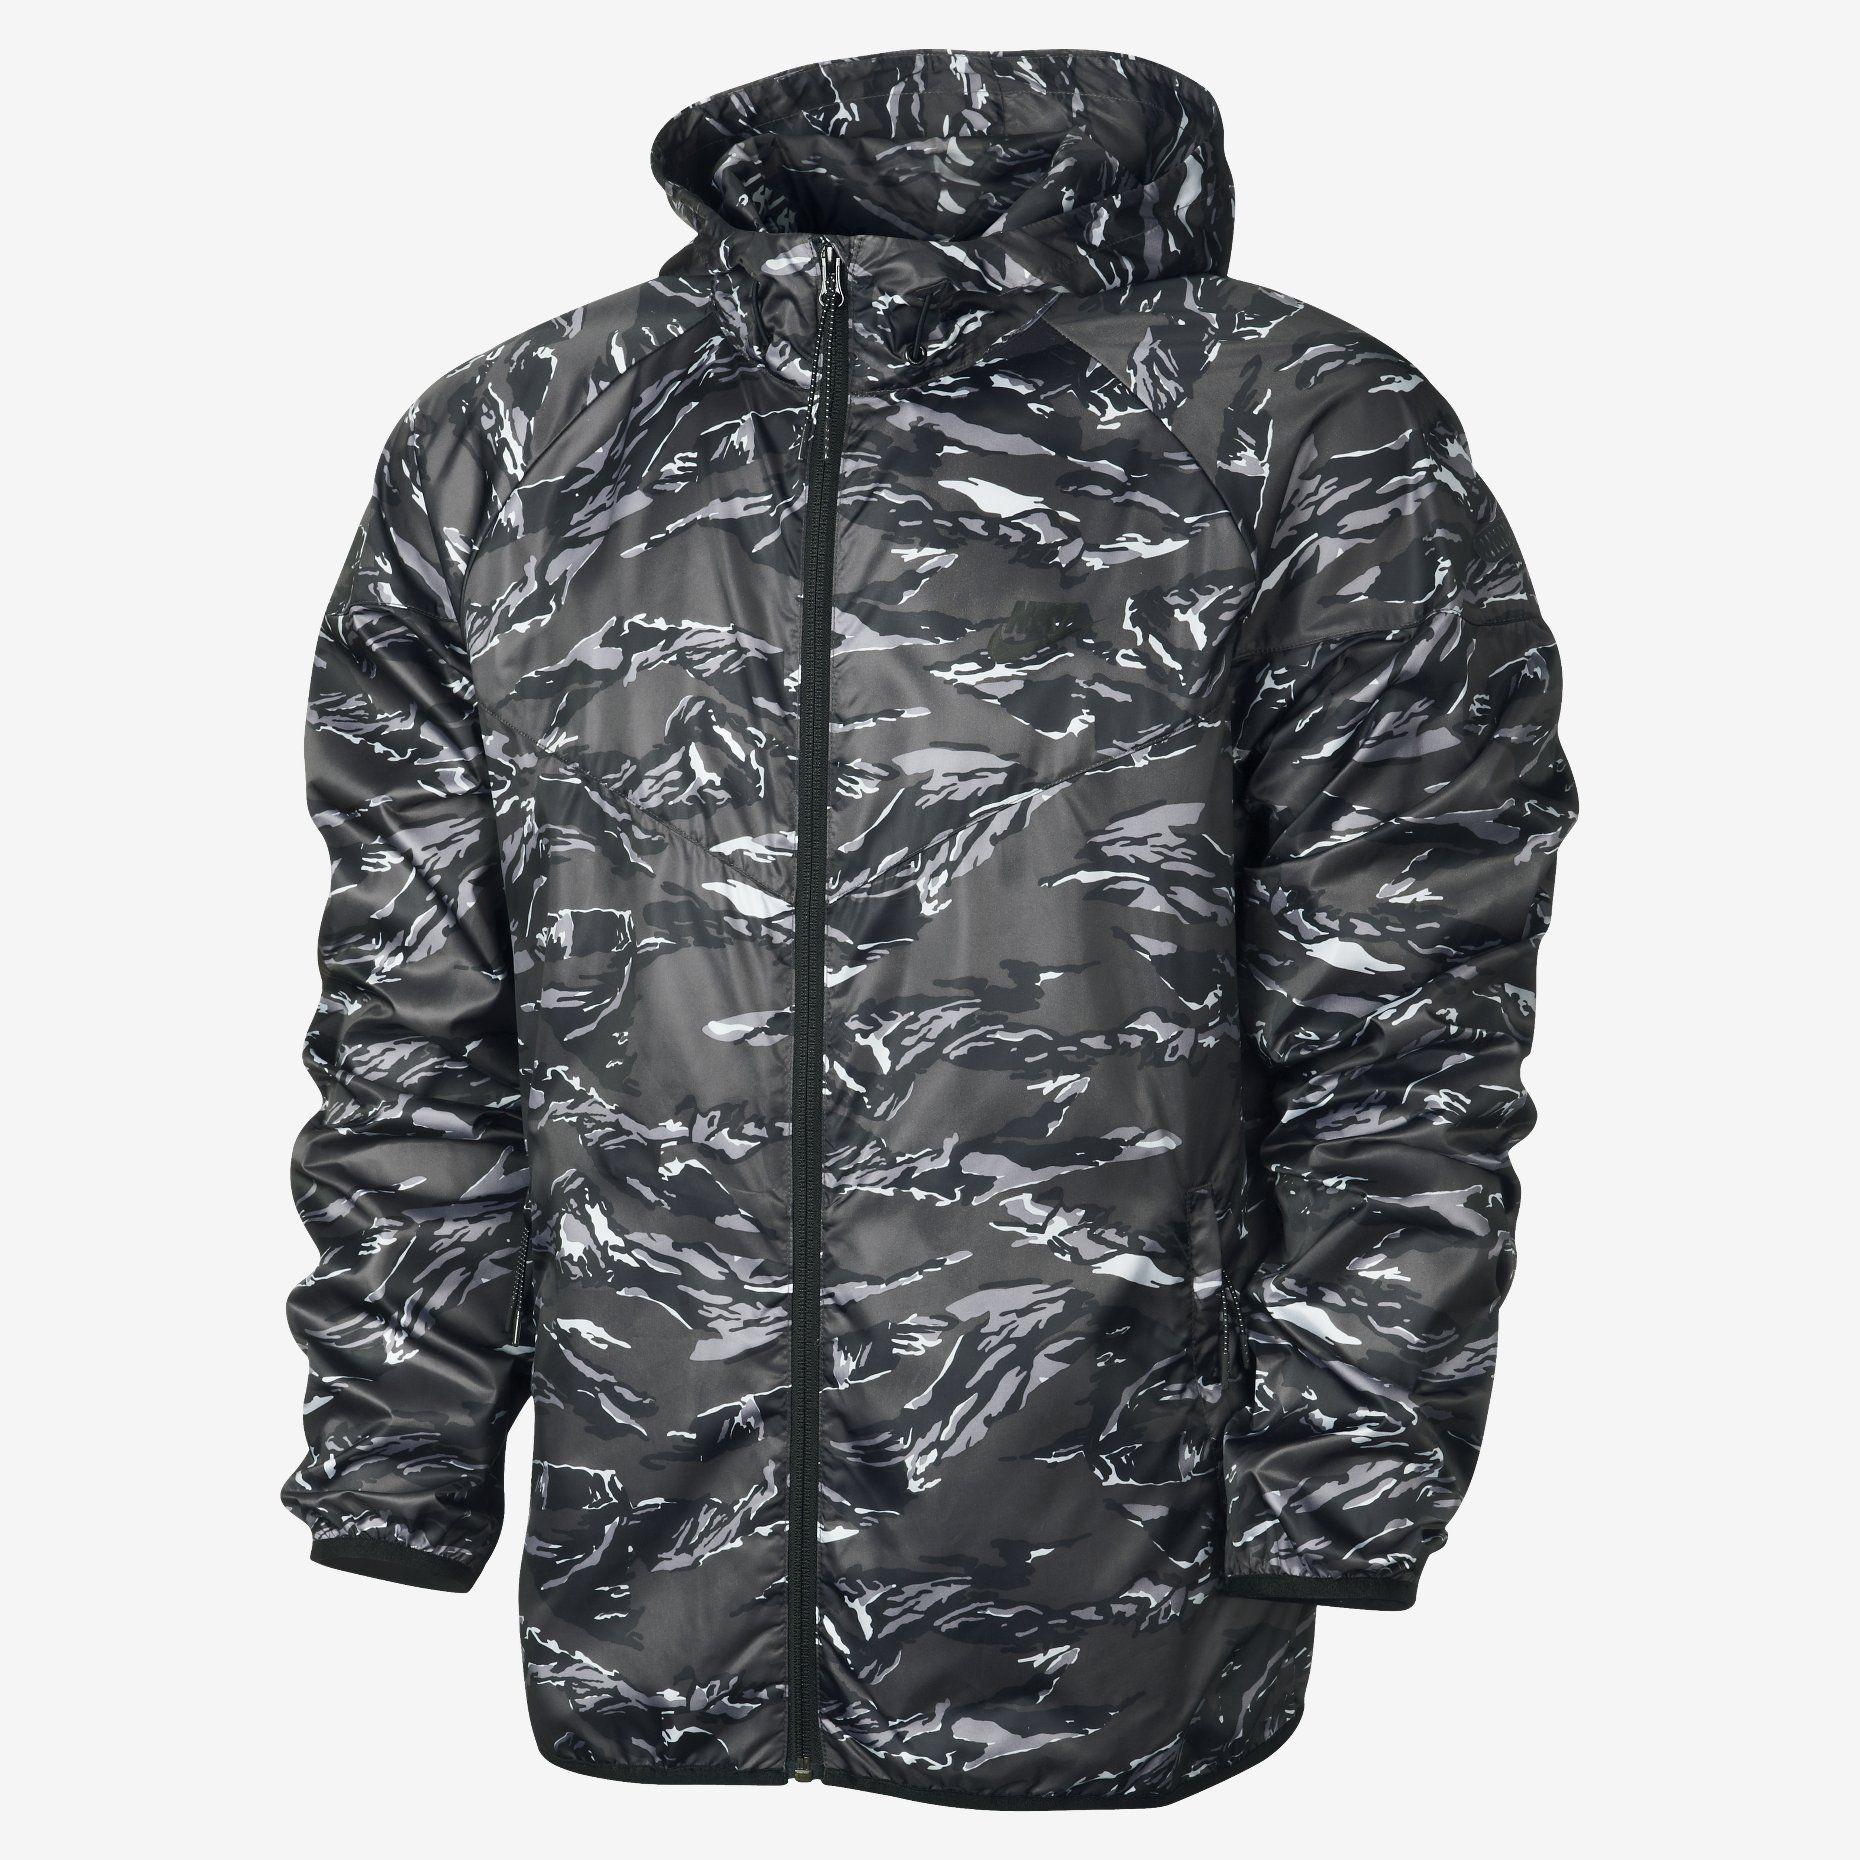 Nike Jacket Camo